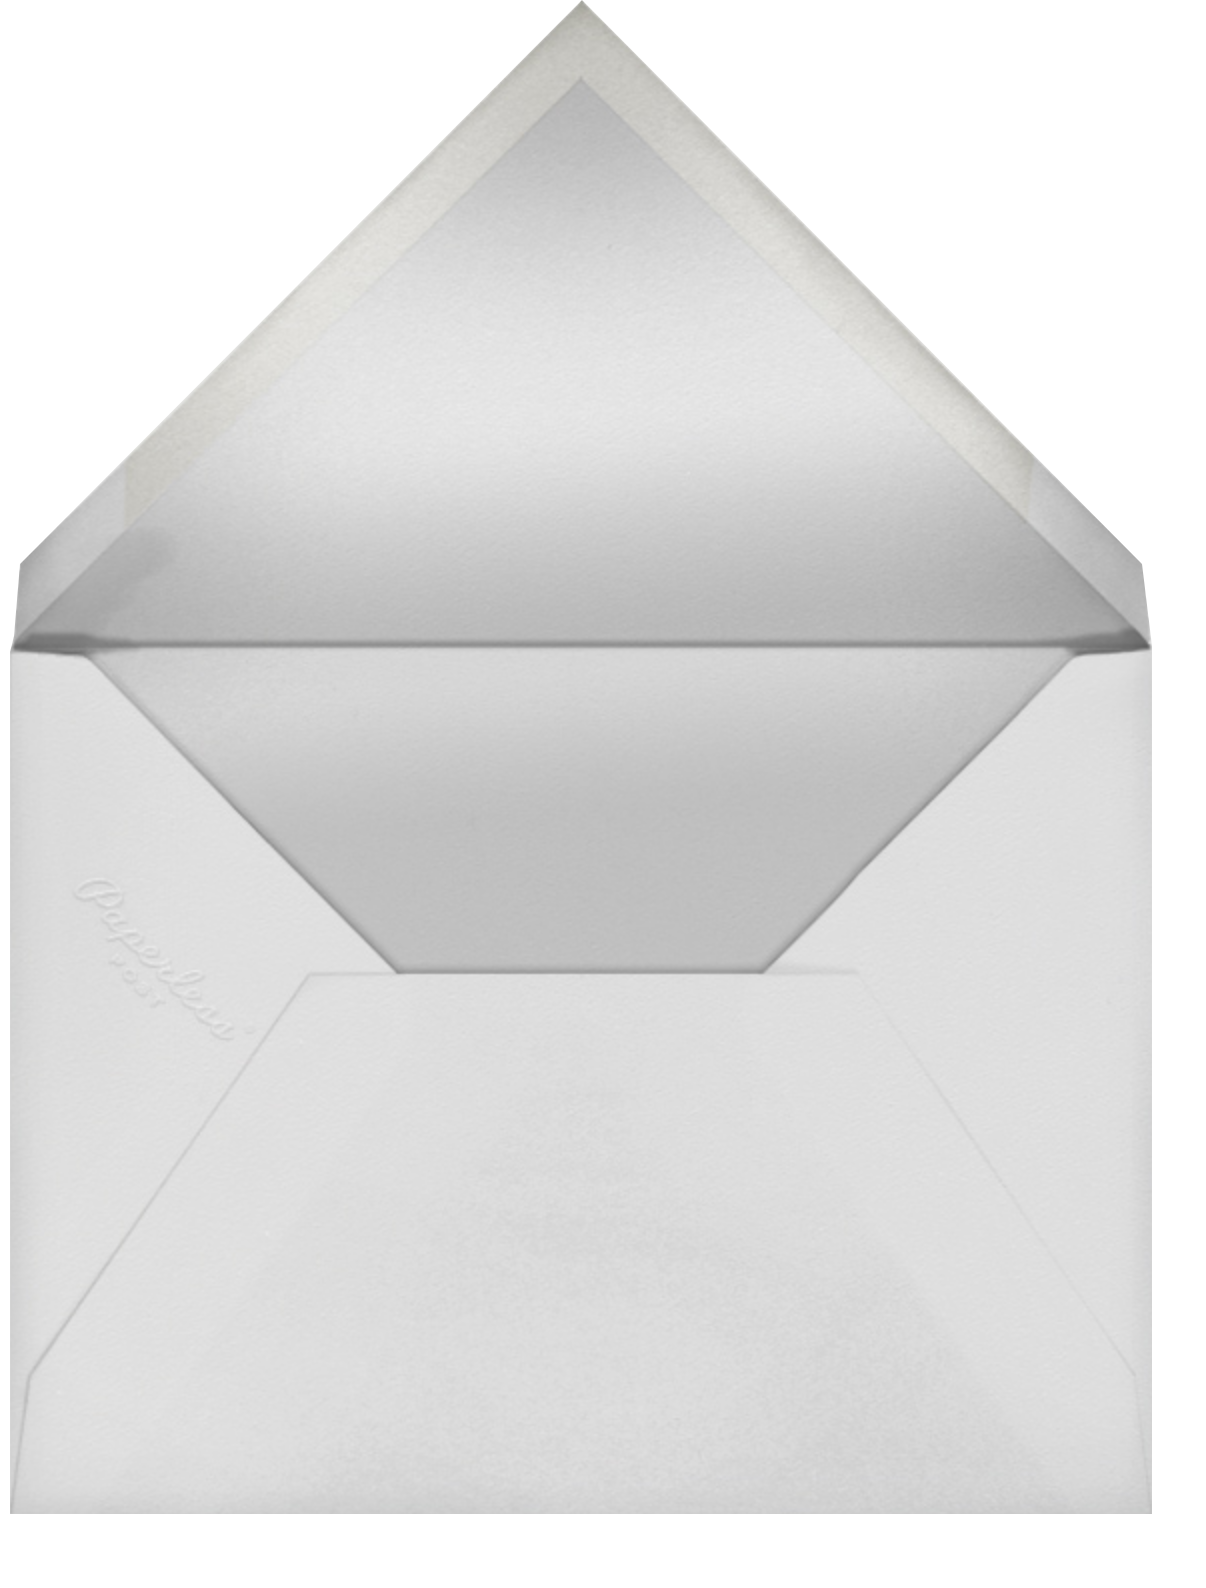 Lord Paisley Lawn (Menu) - Liberty - Menus - envelope back